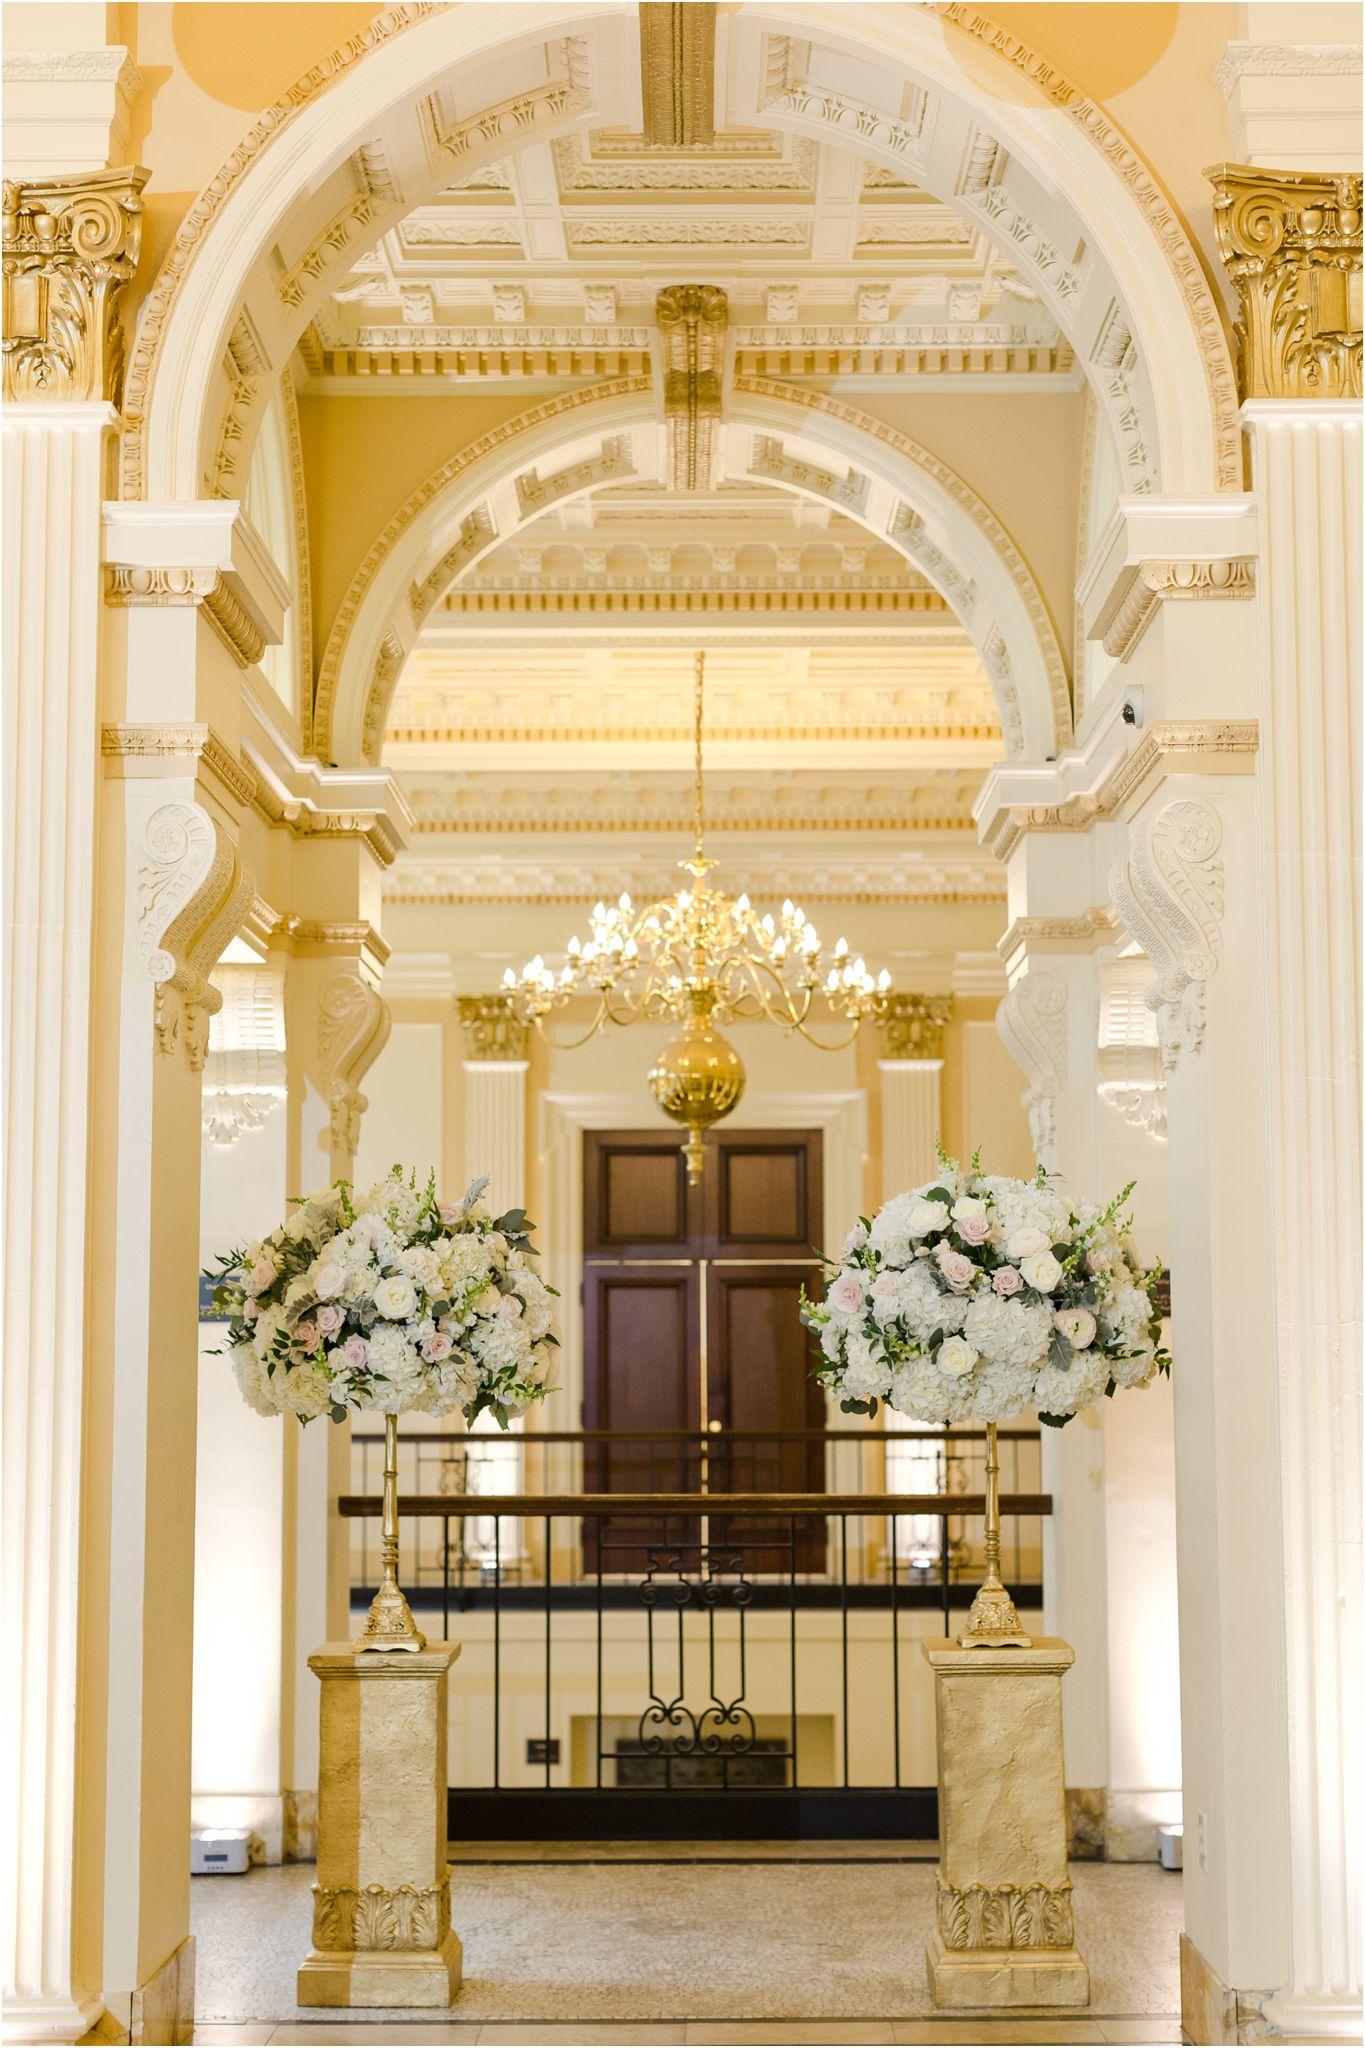 providence-public-library-wedding-images_00029.JPG